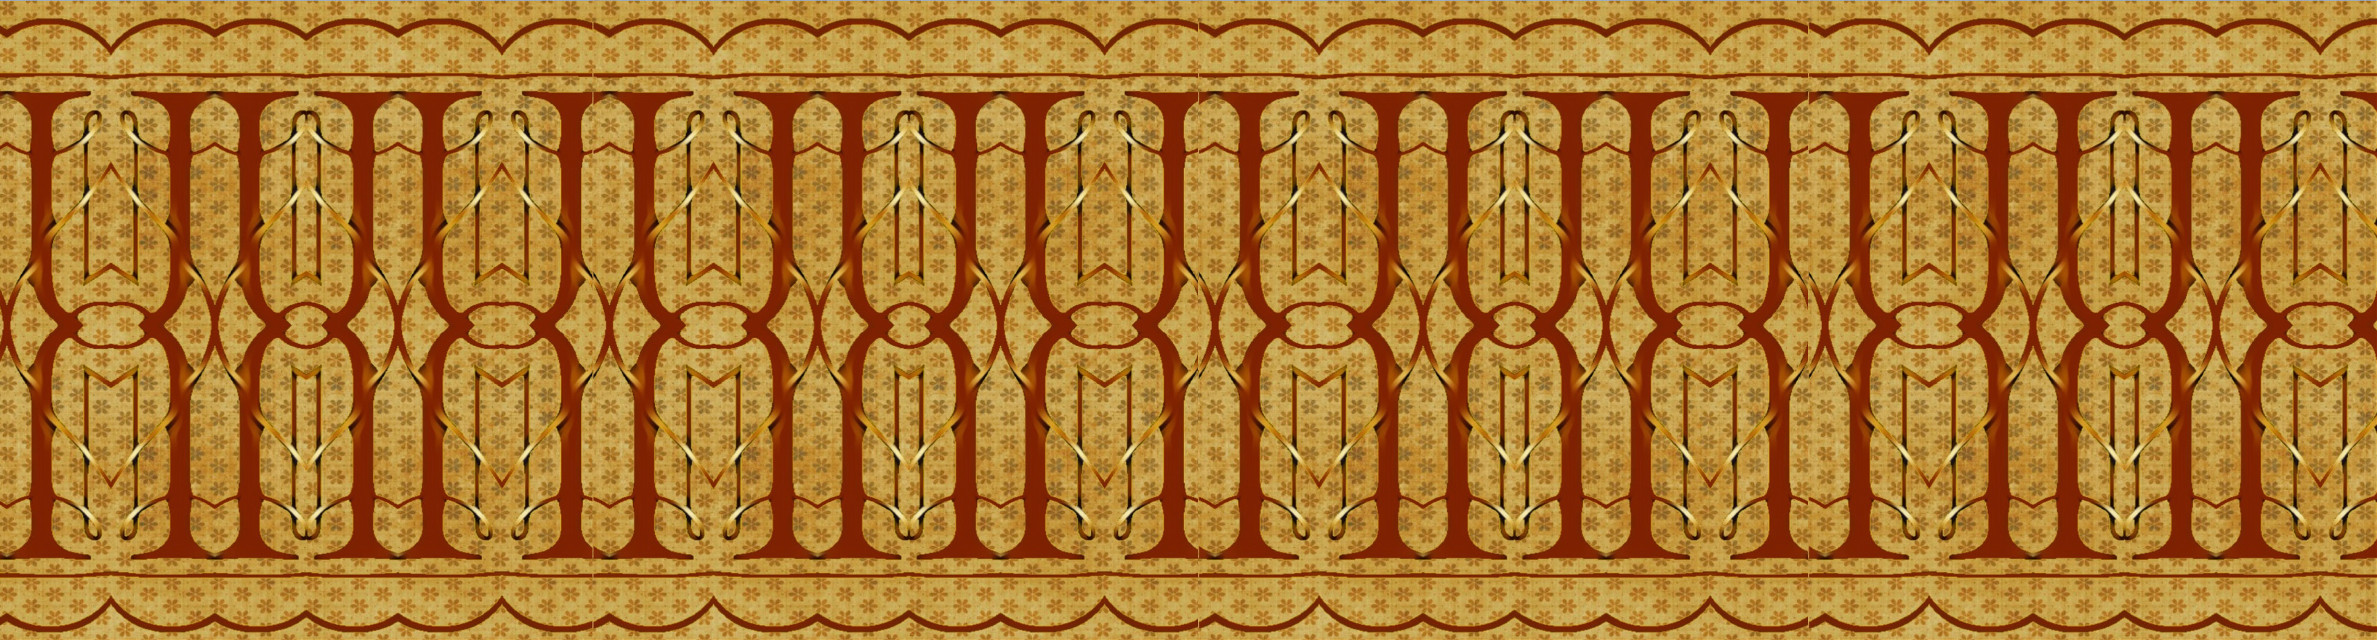 #sfghandmade #frame #frames #victorian #border #line #reddesign #stars #picsarteffects